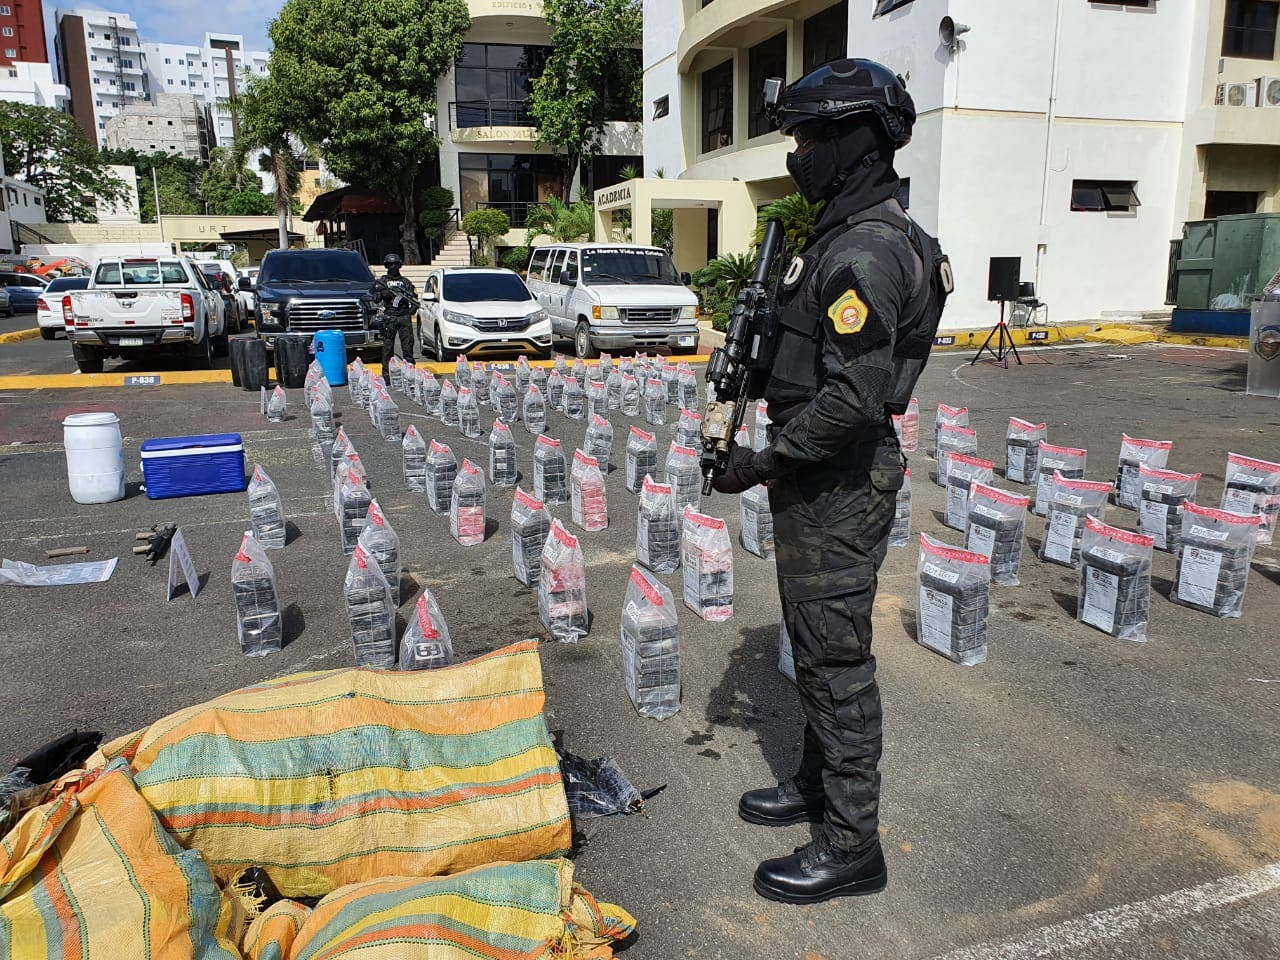 DNCD decomisa 615 paquetes de droga en costas de San Pedro de Macorís y Azua